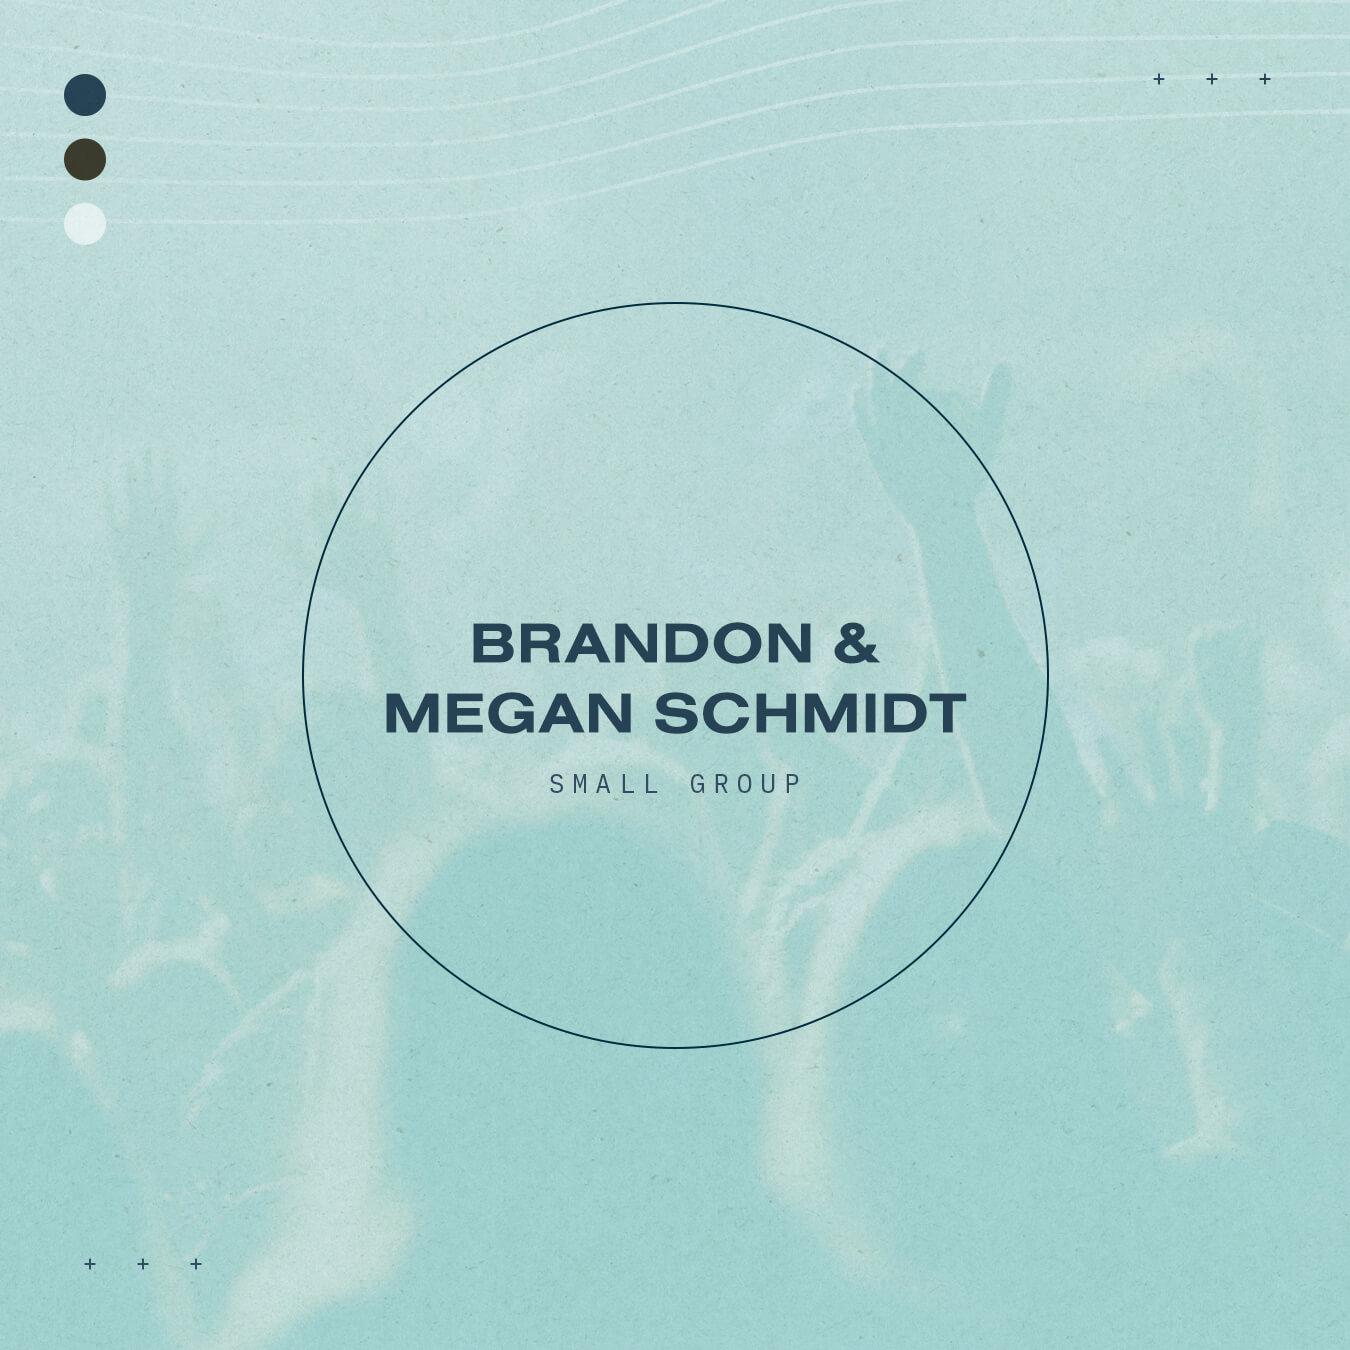 Brandon & Megan Schmidt - Small Group